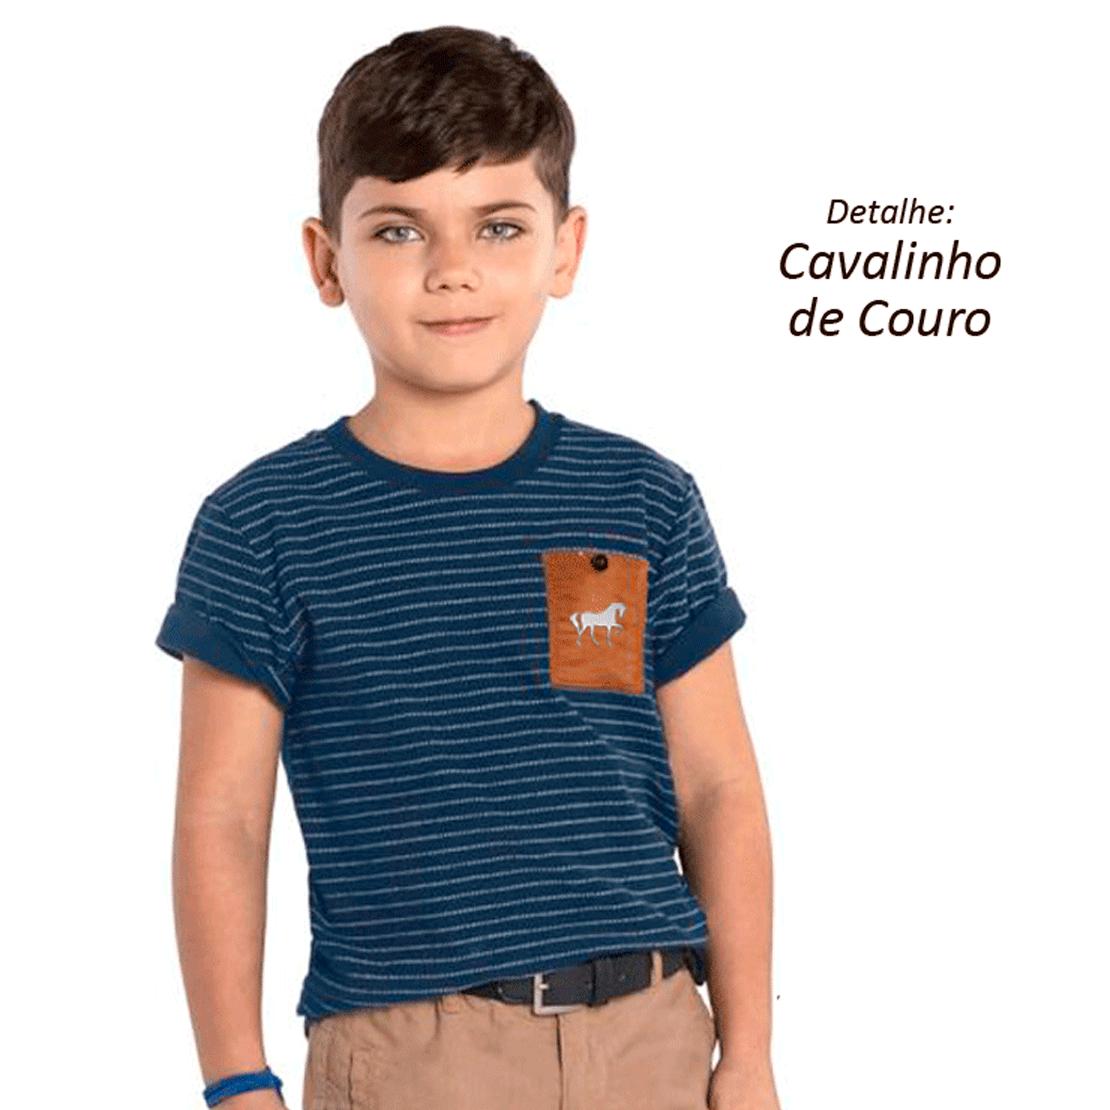 Camiseta kids cavalinhos